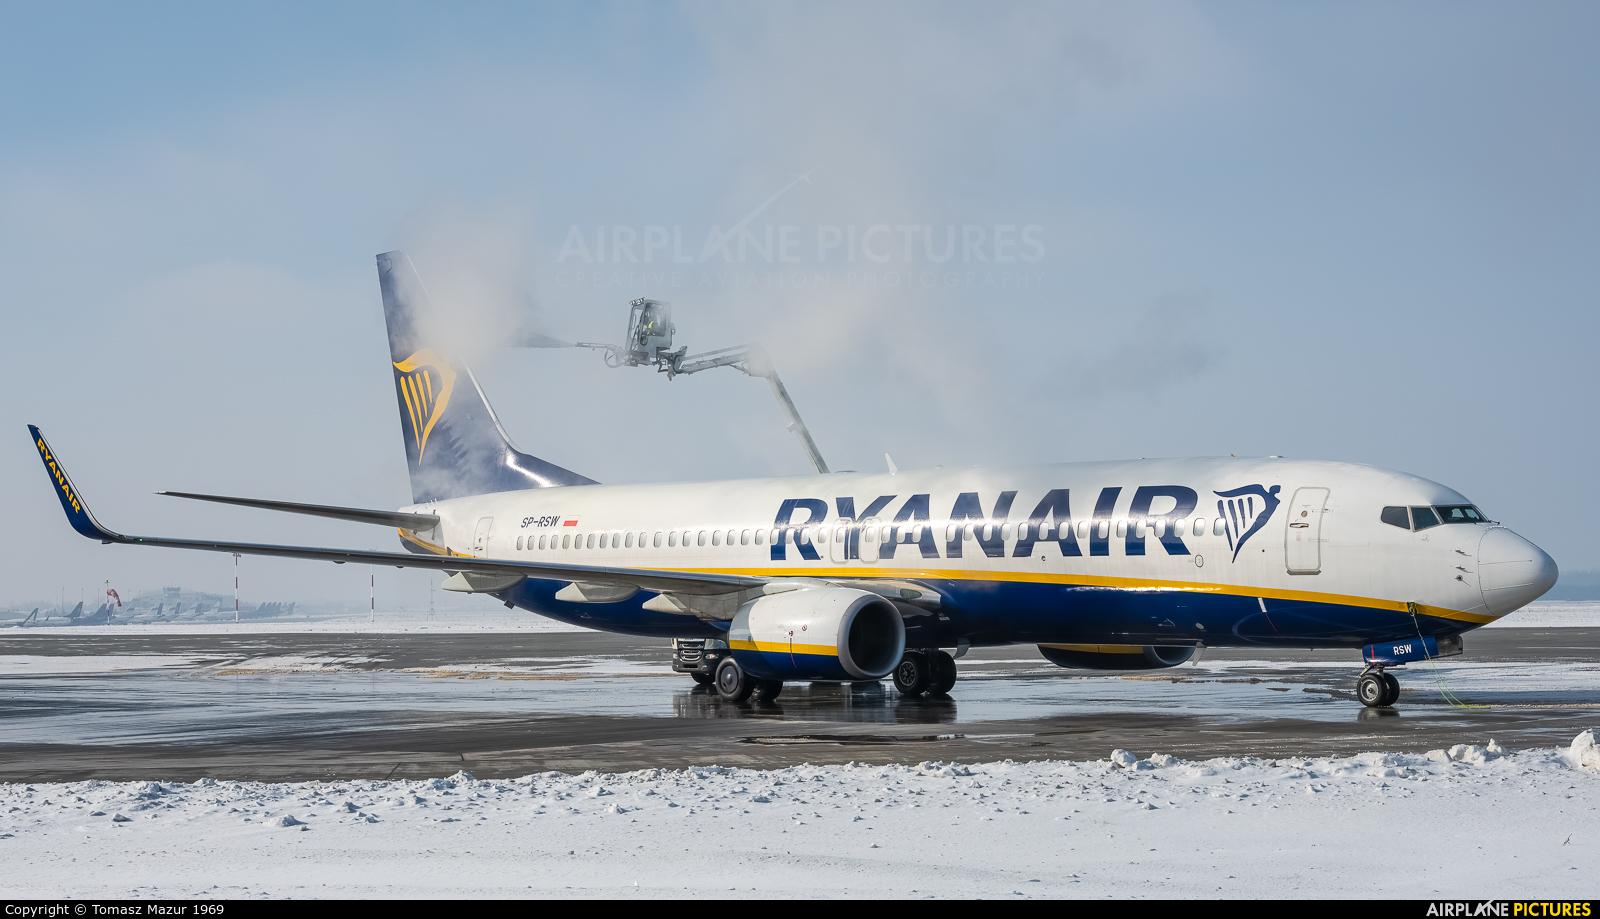 Ryanair Sun SP-RSW aircraft at Katowice - Pyrzowice